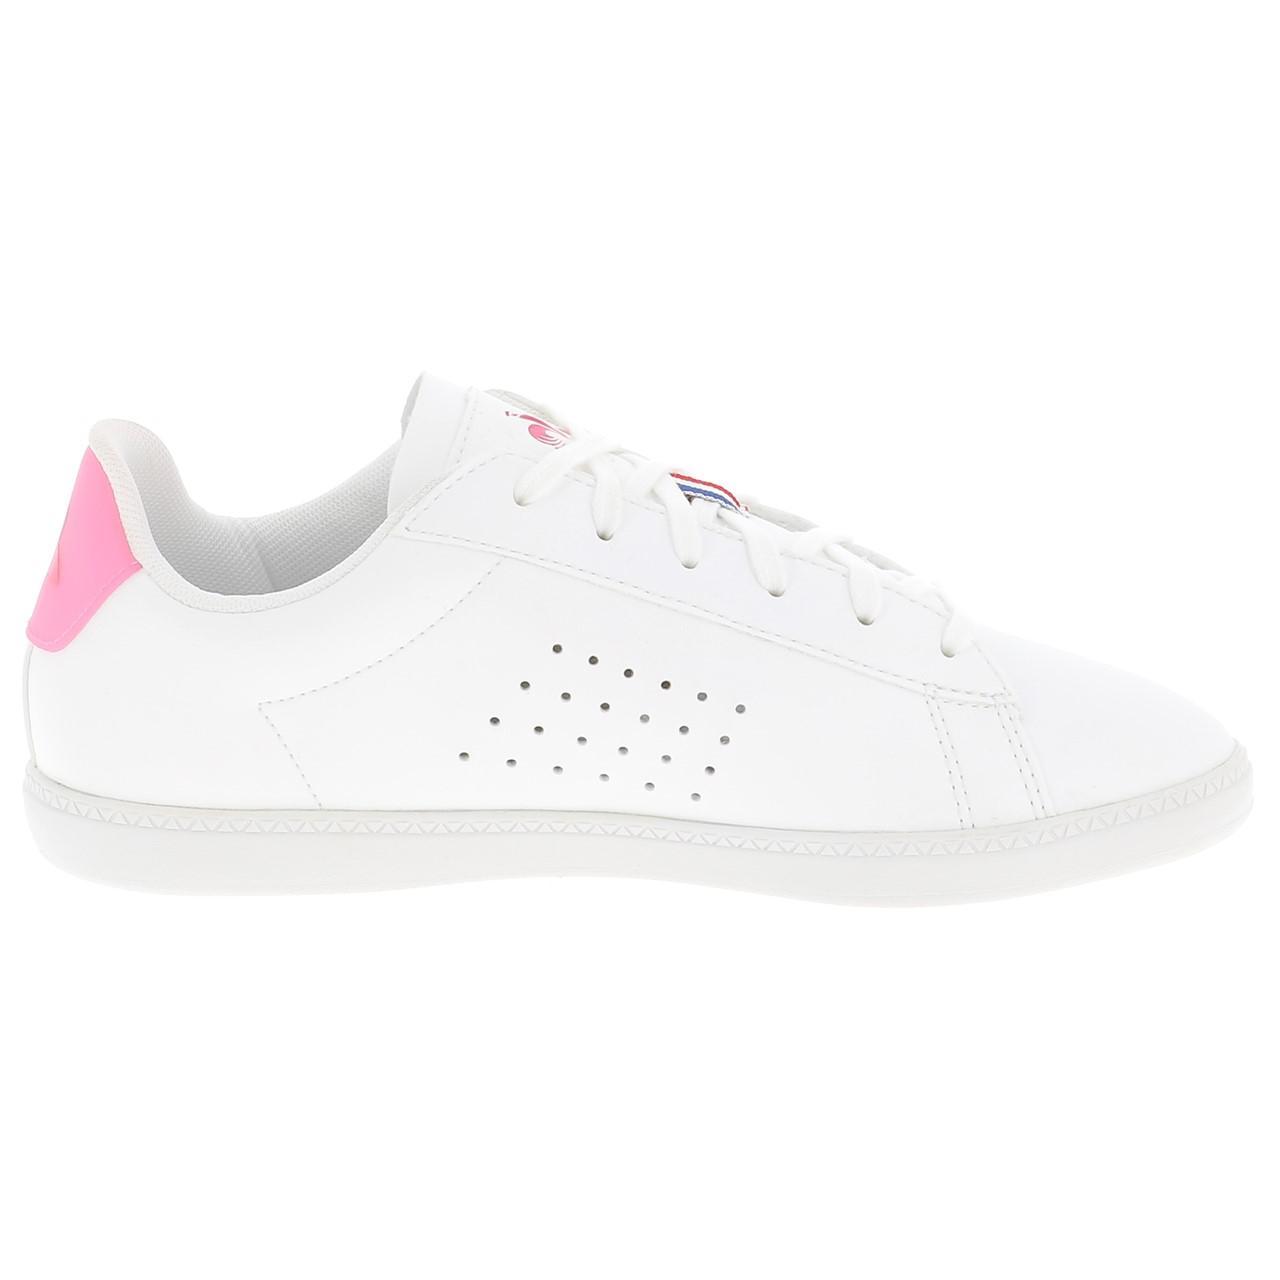 Schuhe-Niedrig-Leder-oder-Faux-Le-Coq-Sportif-Courtset-Maedchen-Blc-Weiss-47681 Indexbild 4